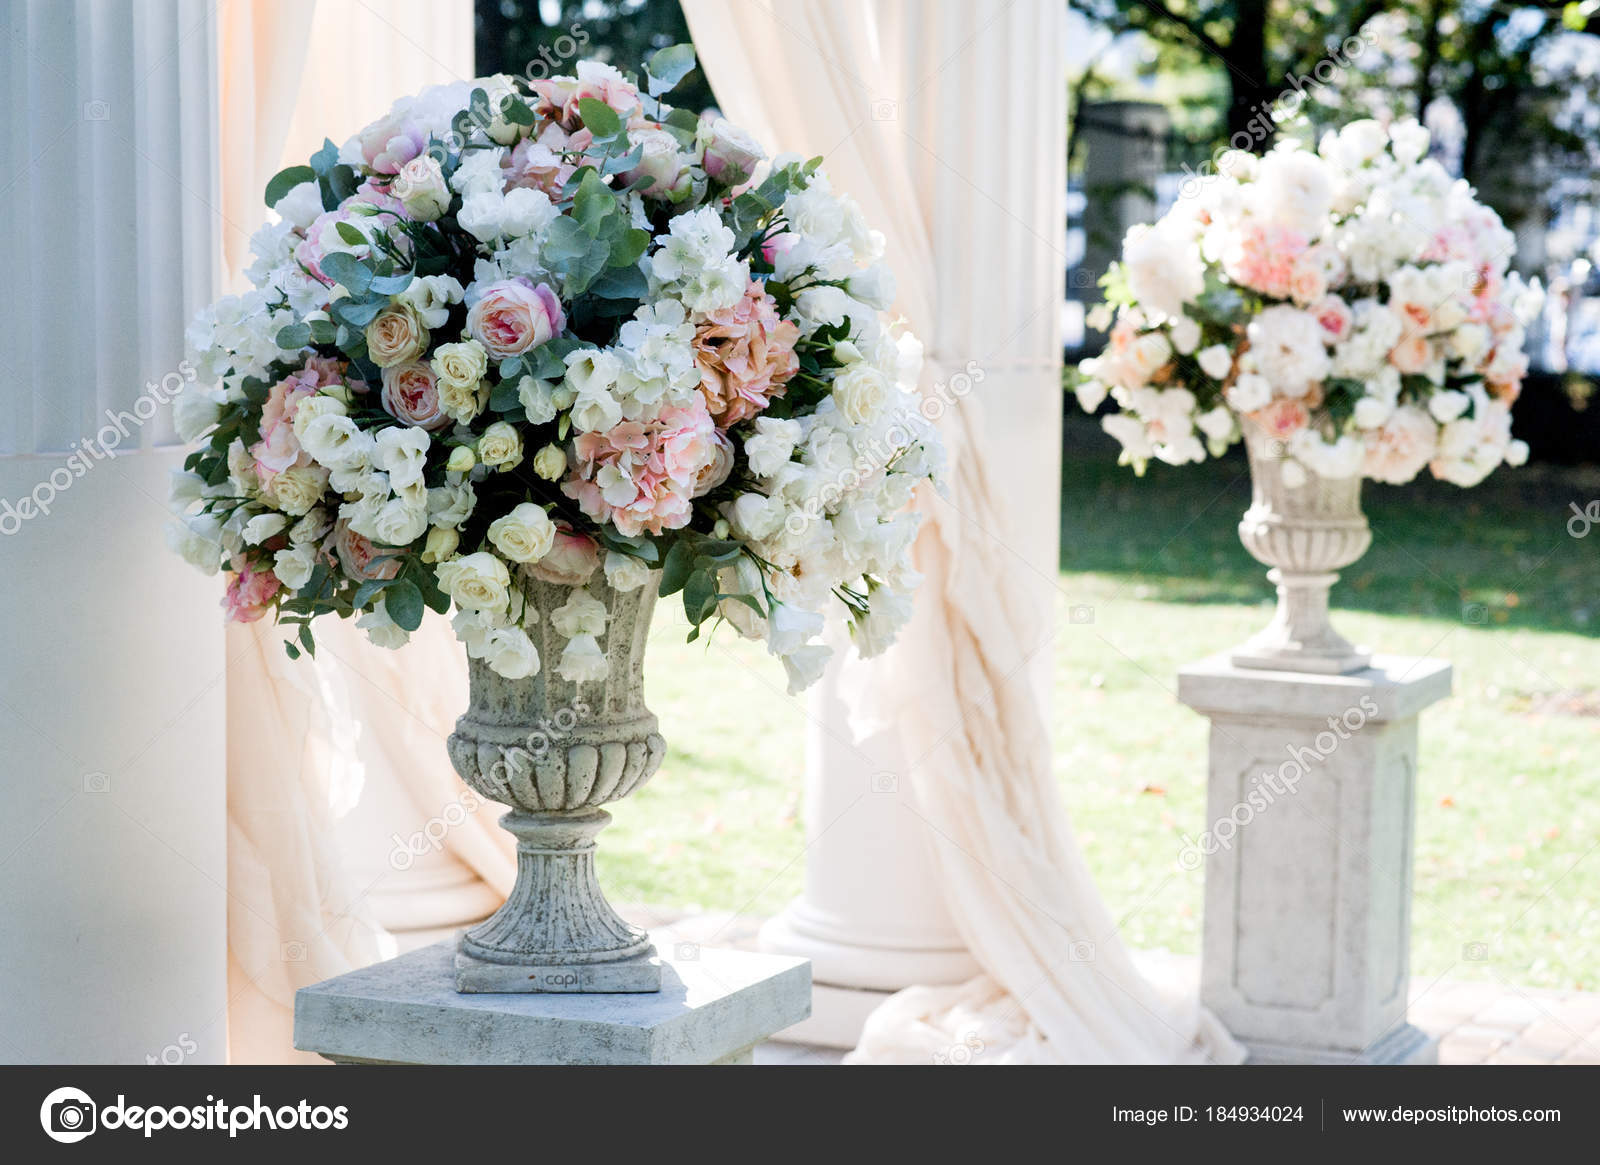 Charming Arco Di Cerimonia Nuziale Bianca Con Grandi Mazzi Di Fiori Pesco Negli  Stand Bianco U2014 Foto Di VadymPastukh